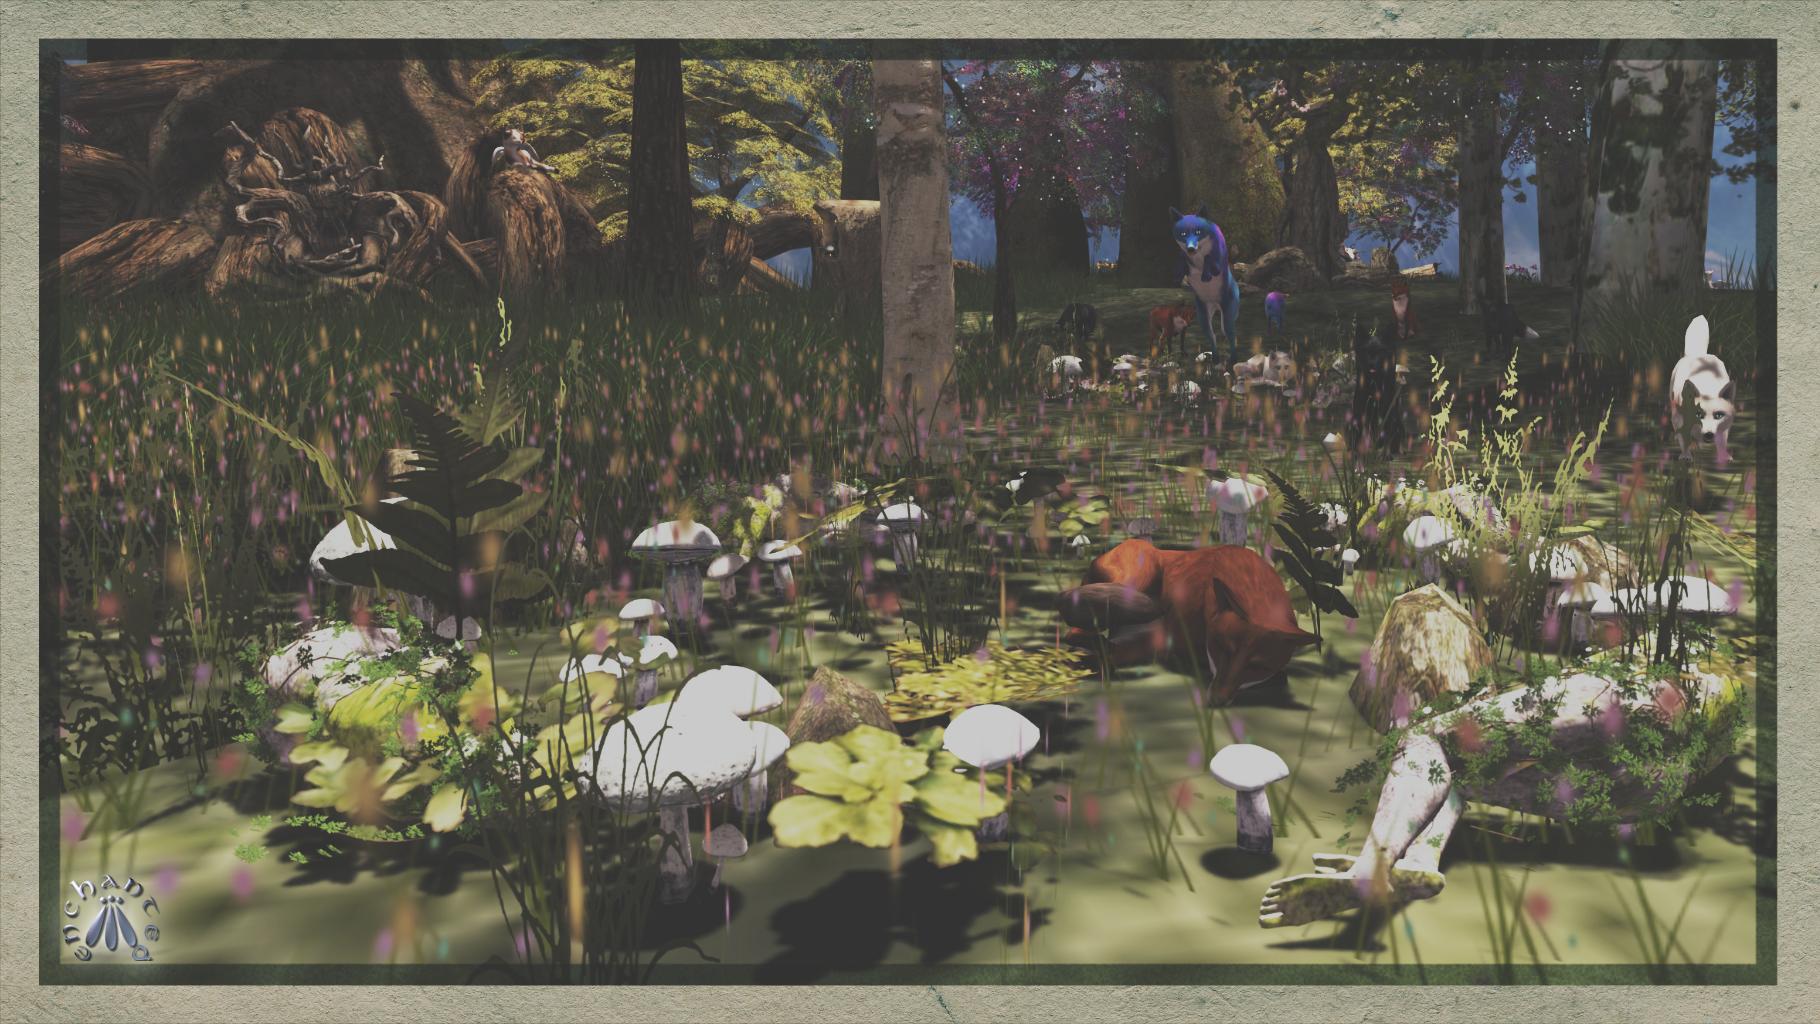 enchantment kitsune 3 edit - 4 BLOG